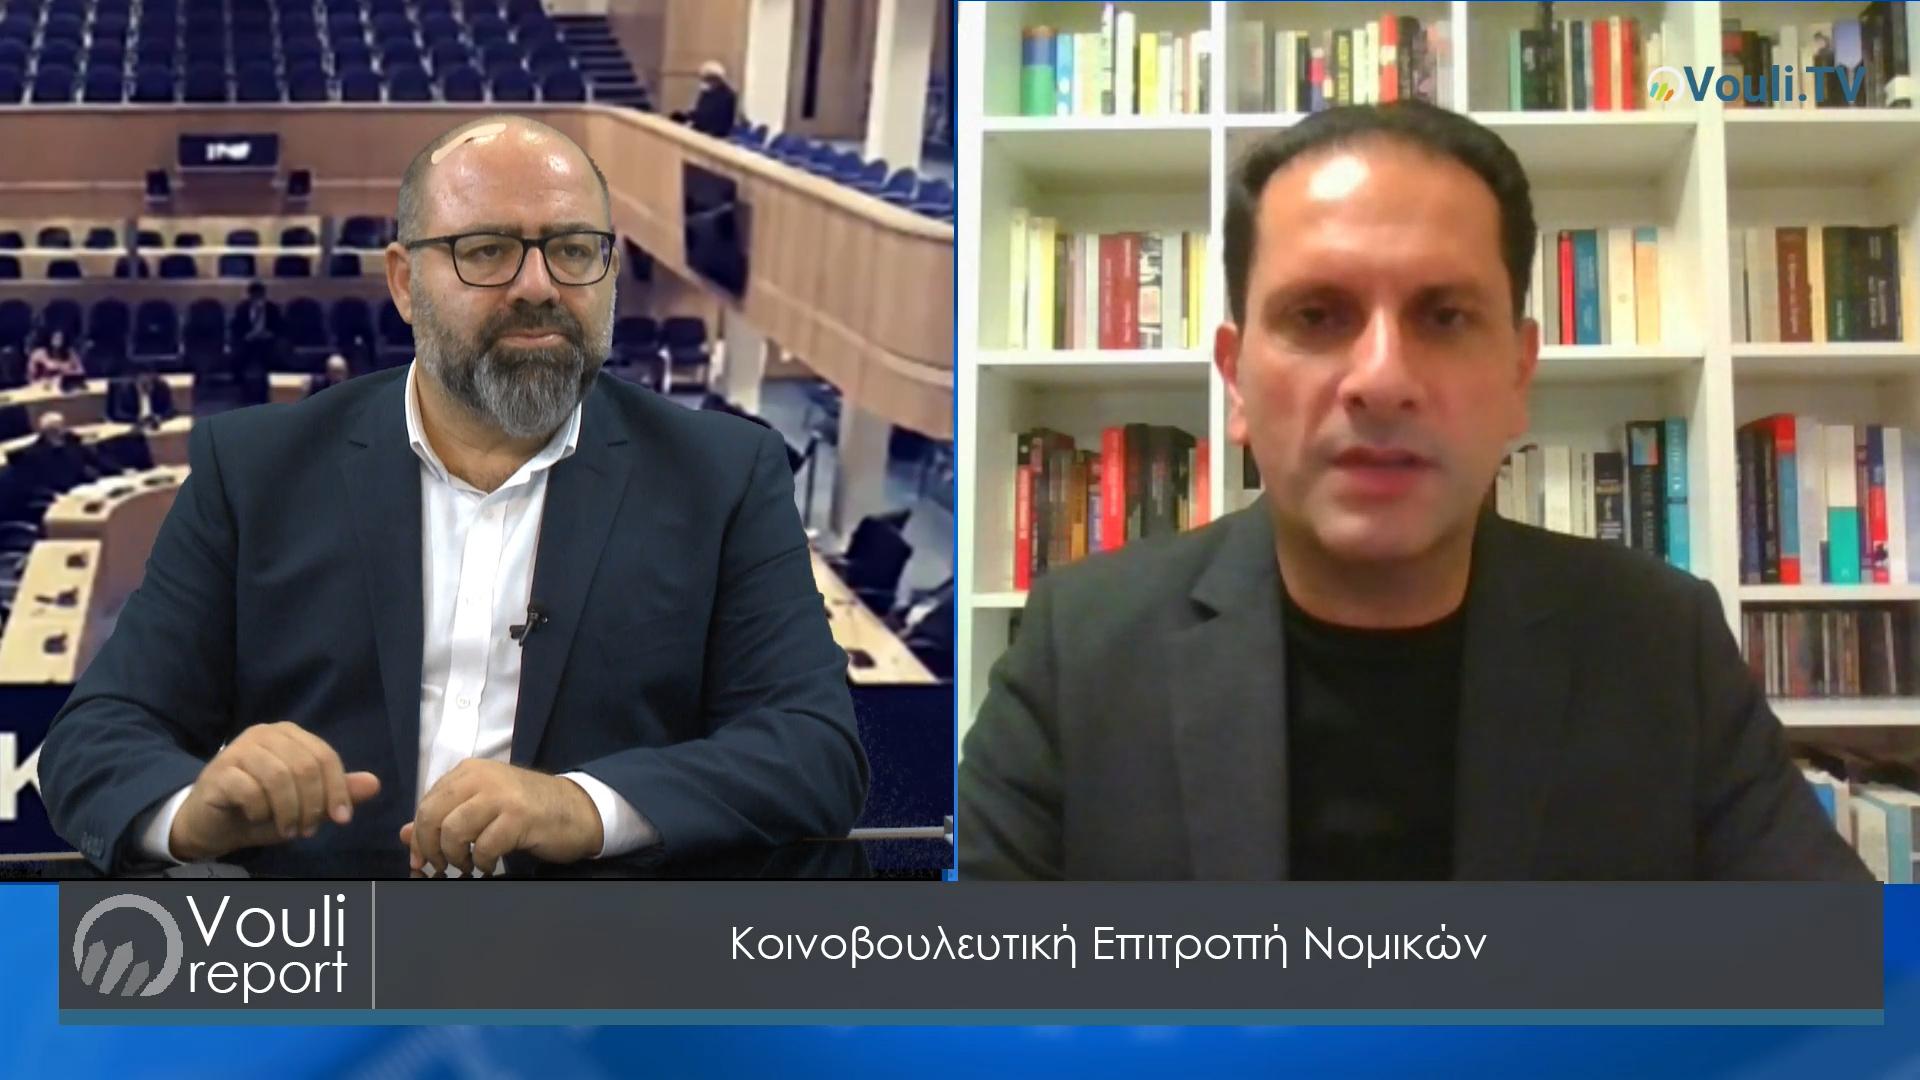 Vouli report - 02/12/2020   Κοινοβουλευτική Επιτροπή Νομικών